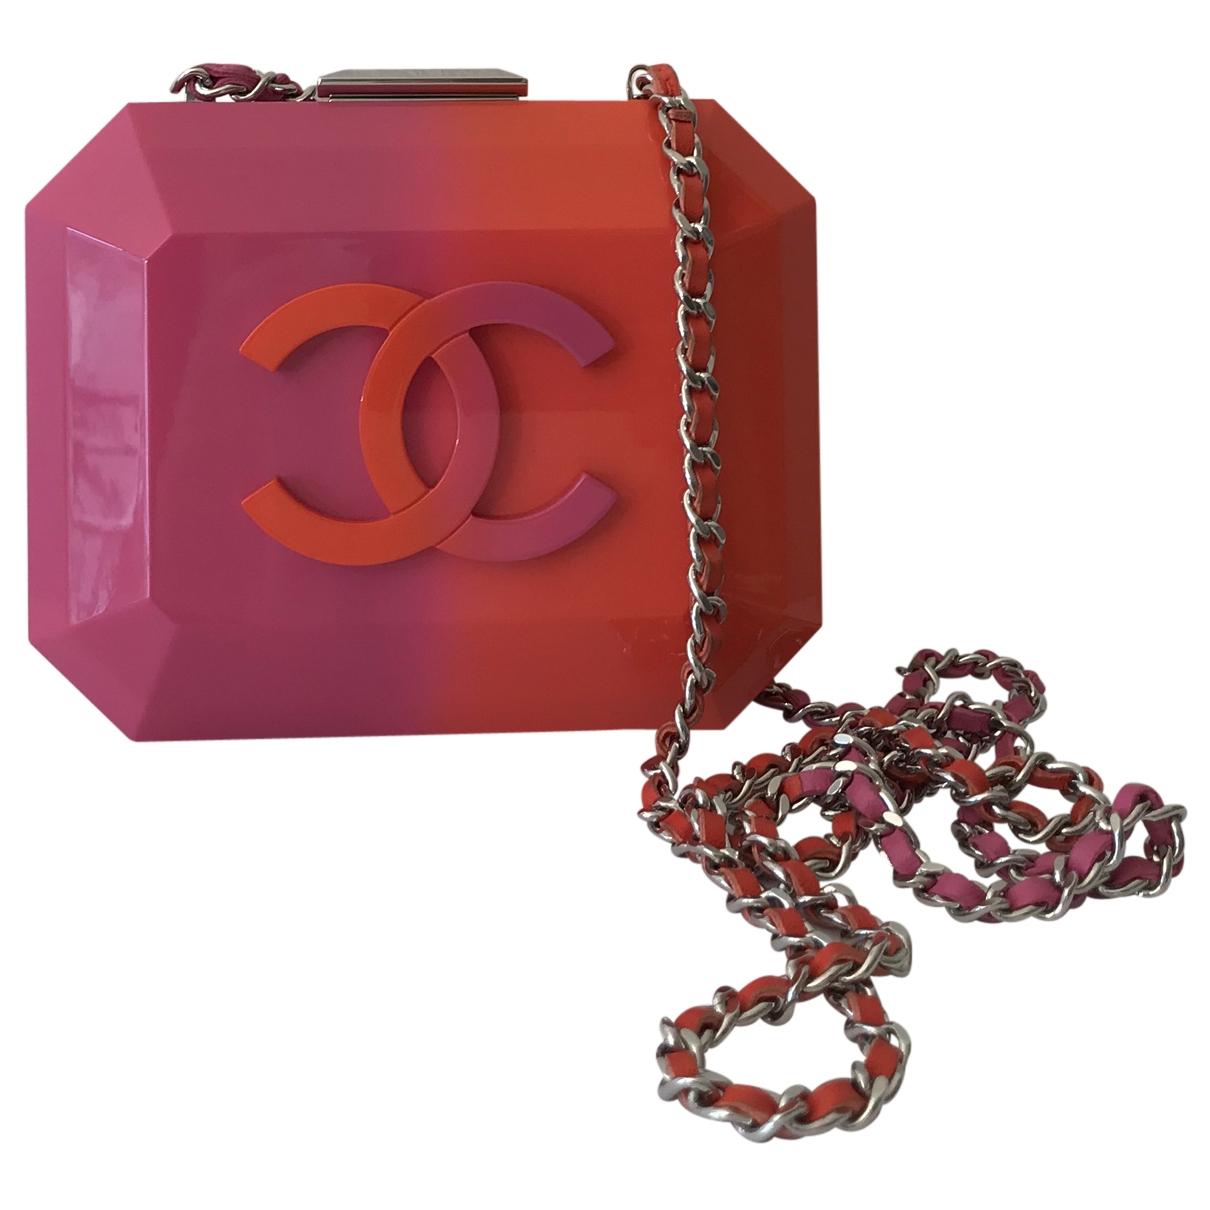 Chanel \N Pink Clutch bag for Women \N